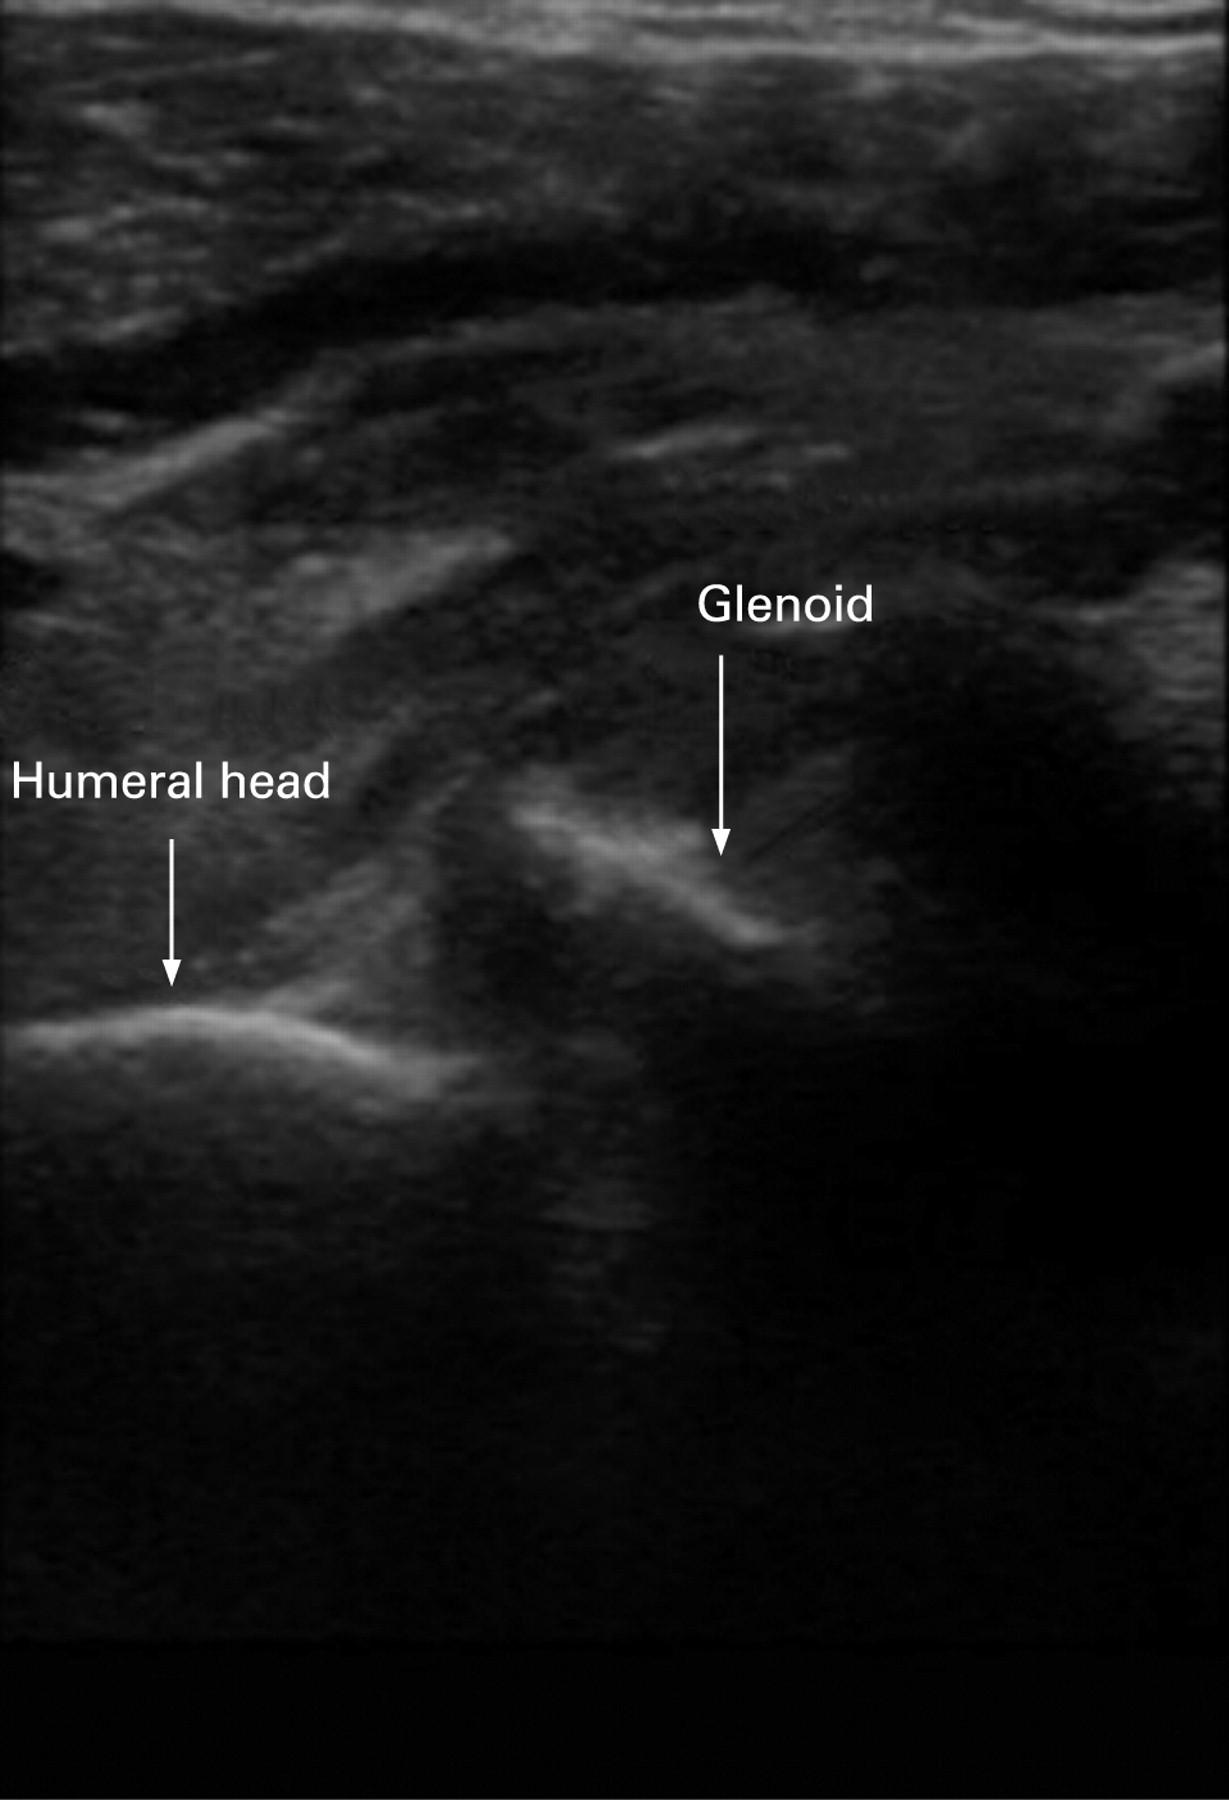 Ultrasound Photos Of Baby Girl: Shoulder Dislocation Ultrasound